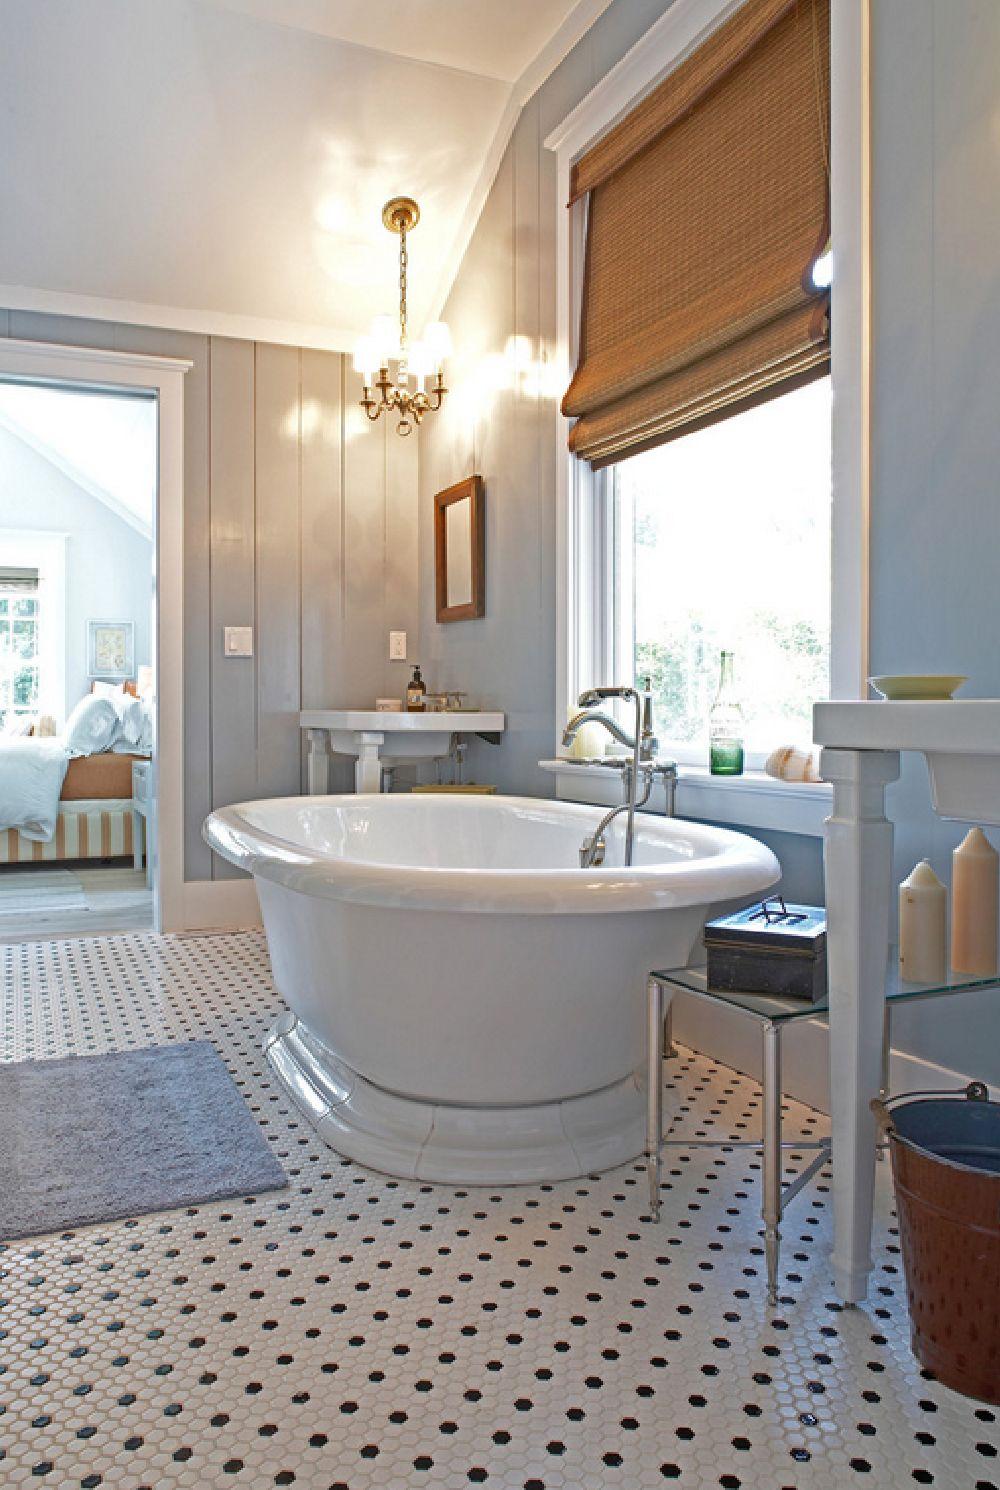 adelaparvu.com despre casa in Hamptons, arhitectura Historical Concept, designer interior Steven Gambrel, Foto Marco Ricca (14)